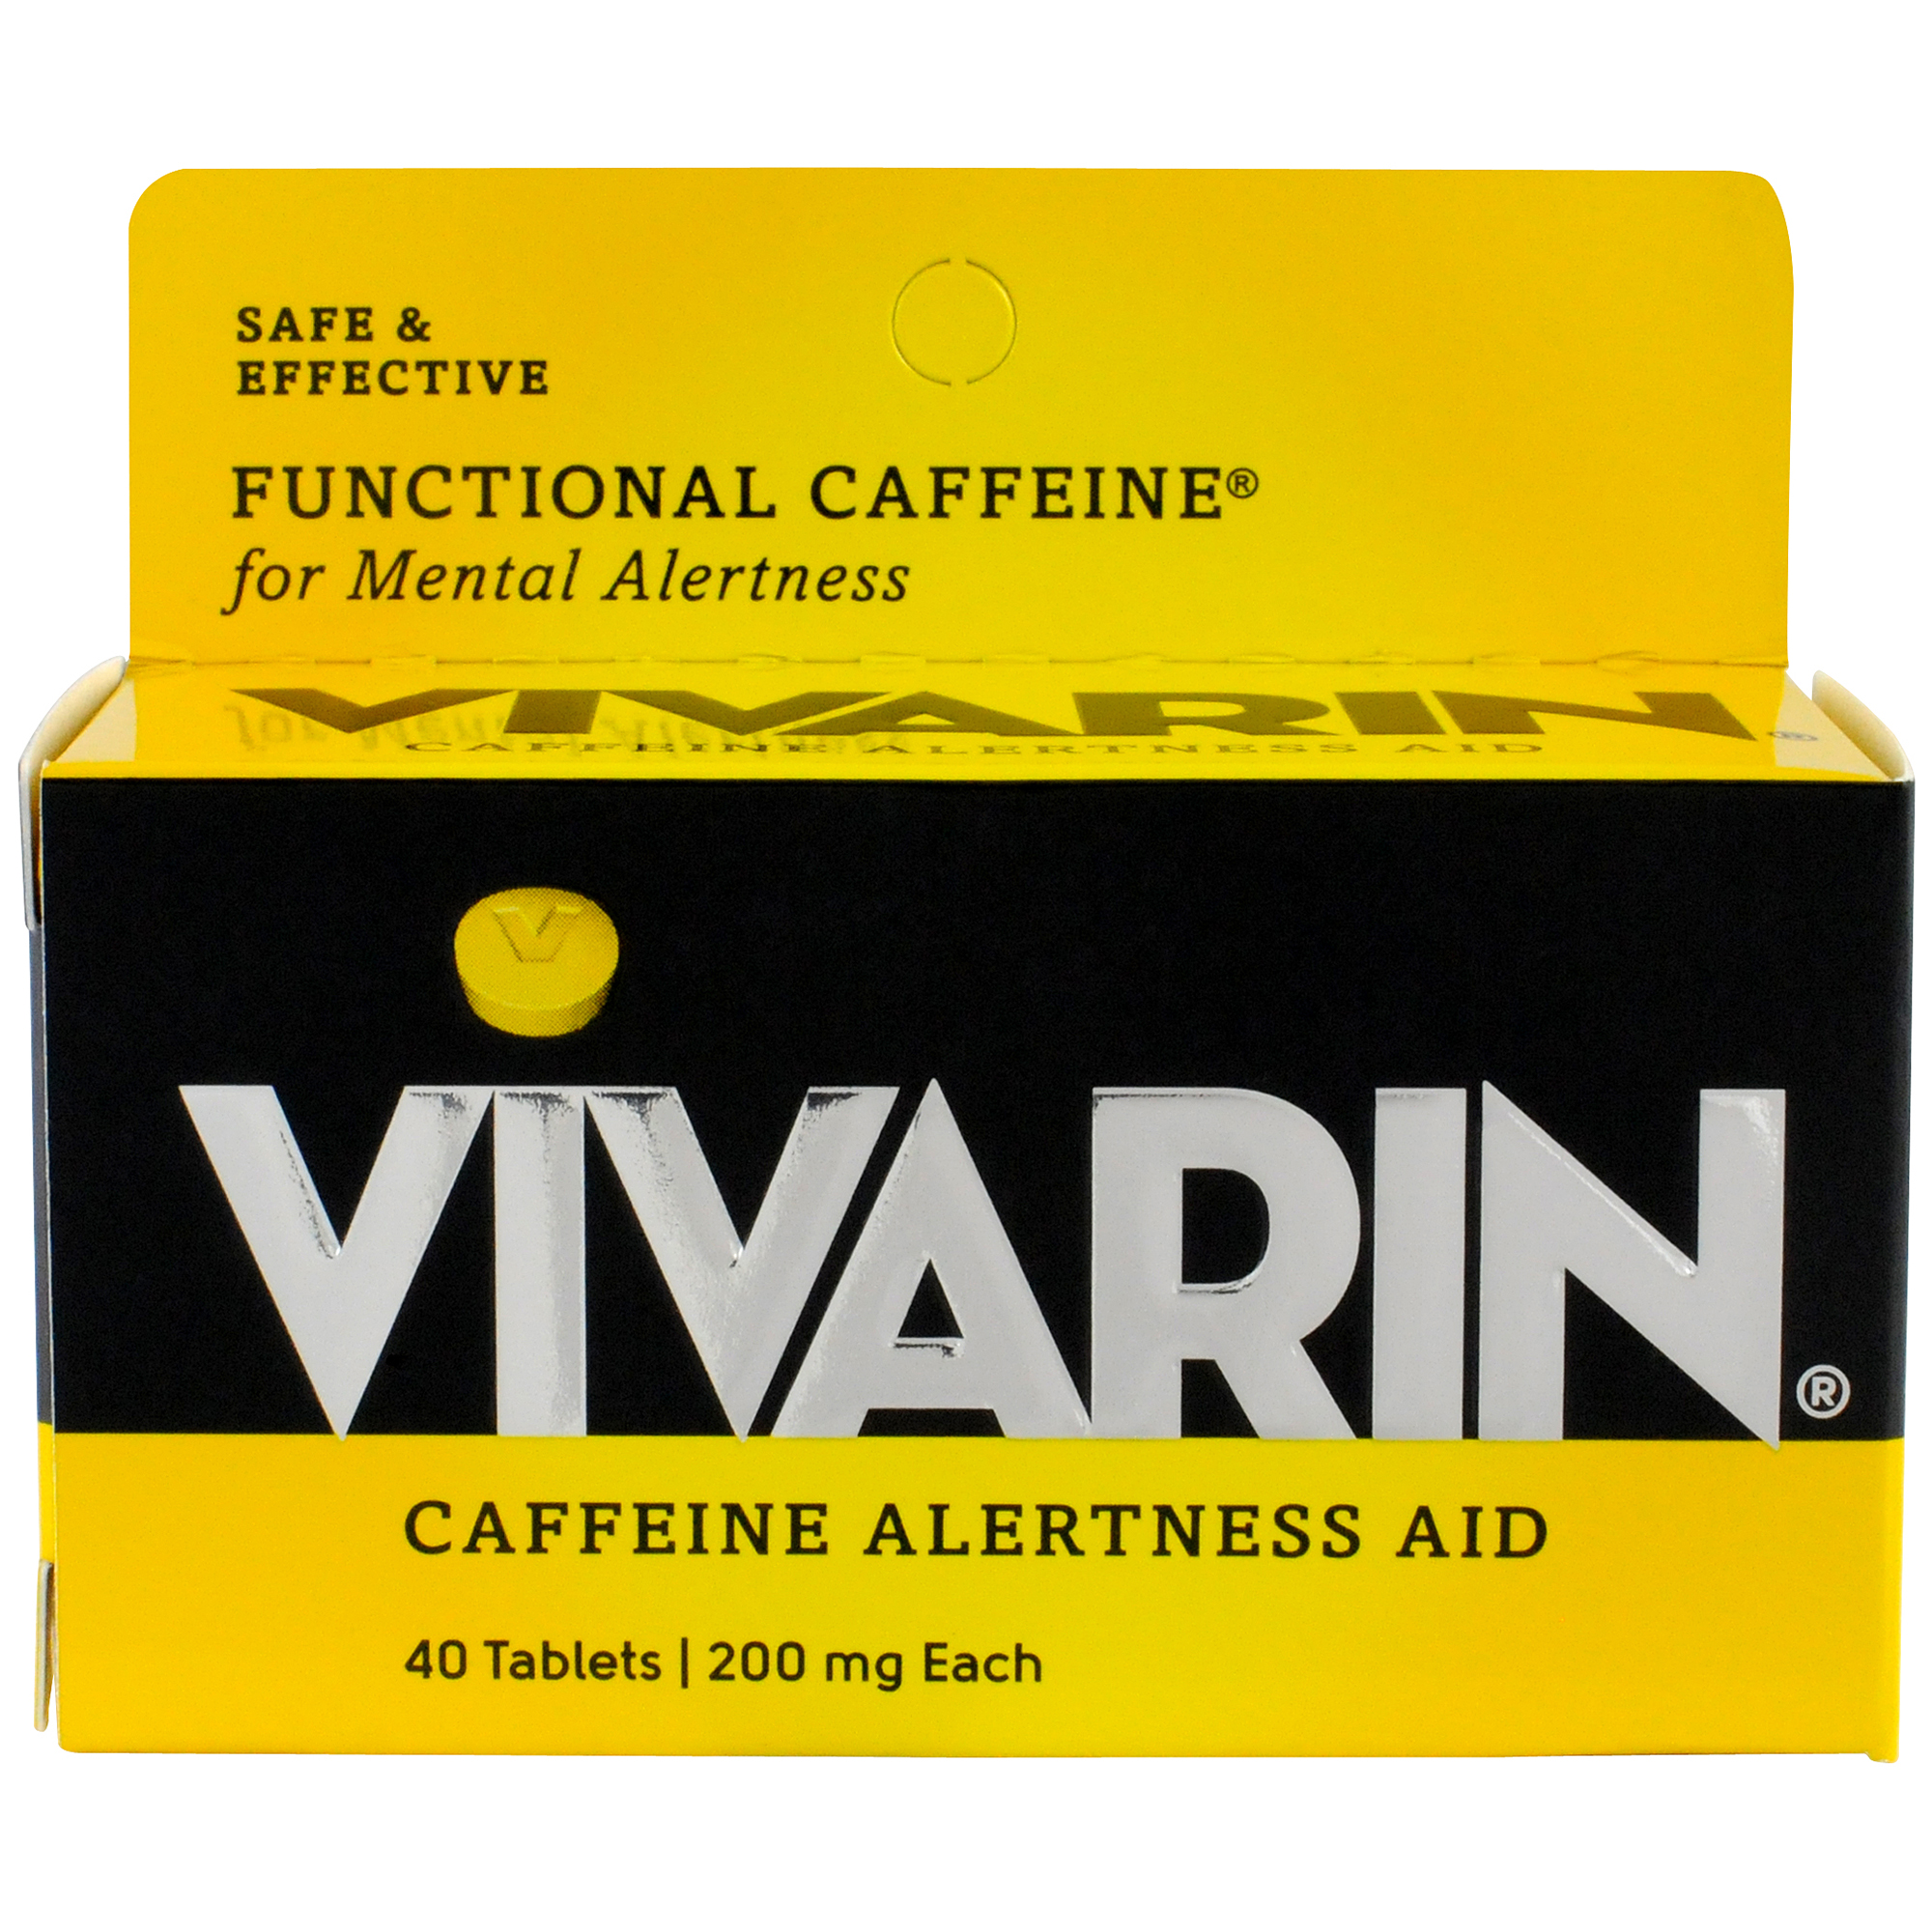 Vivarin Caffeine Alertness Aid, 200mg, 40 ct